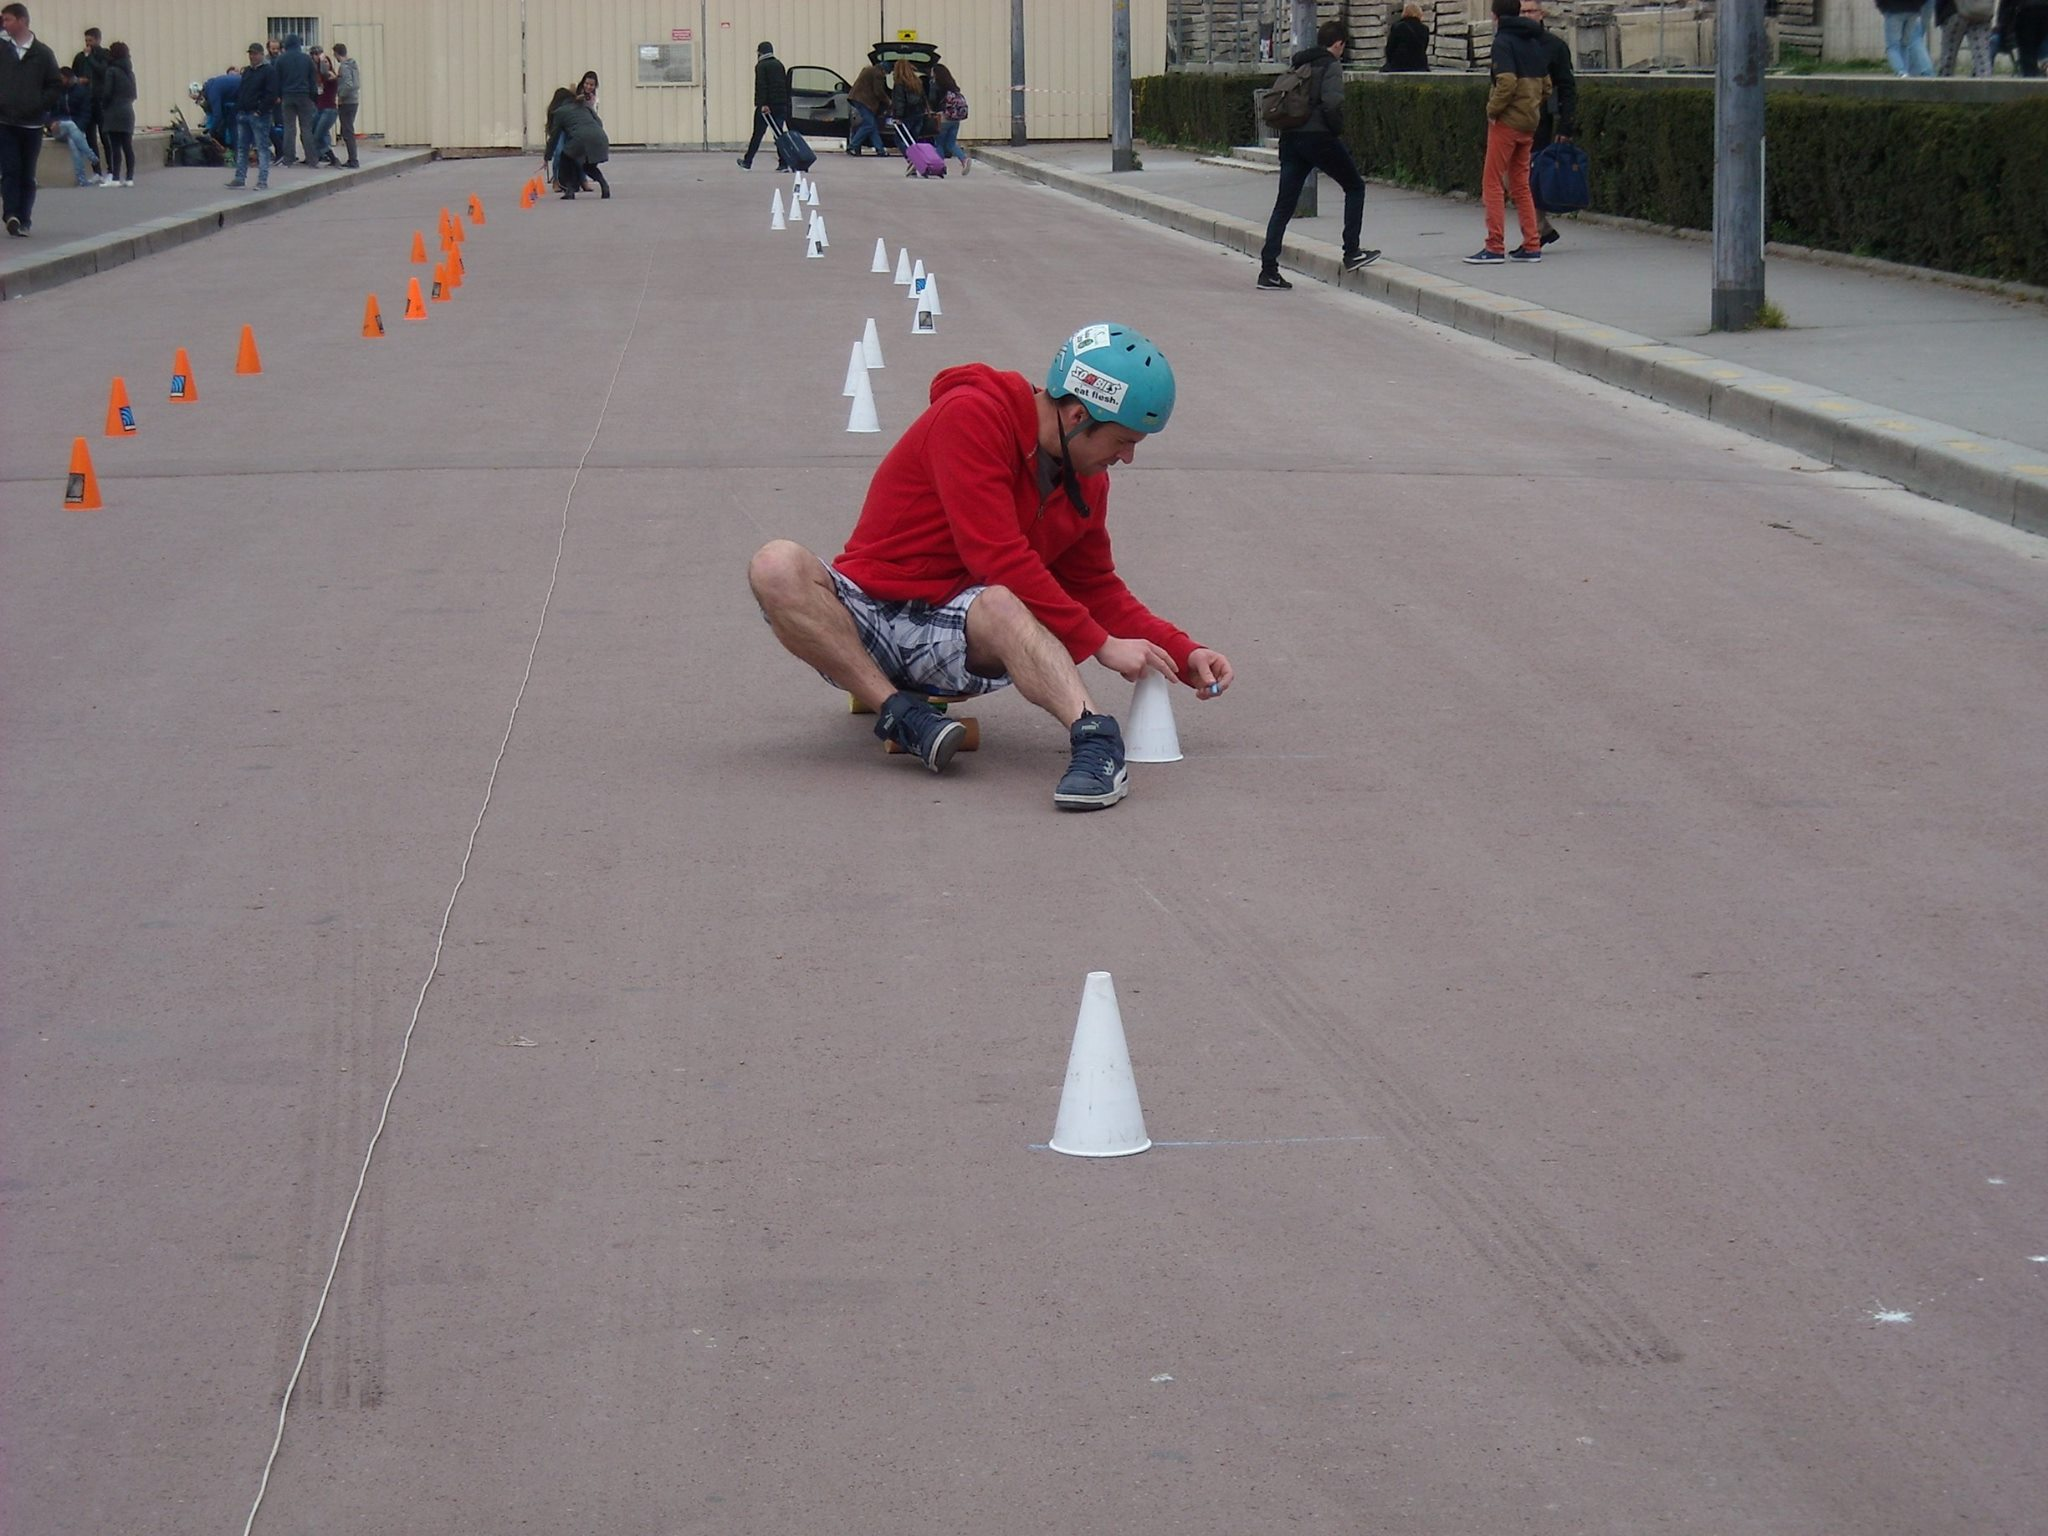 Pirate Slalom skateboard Riderz 2016 - 5 - Vincent au Trocadero